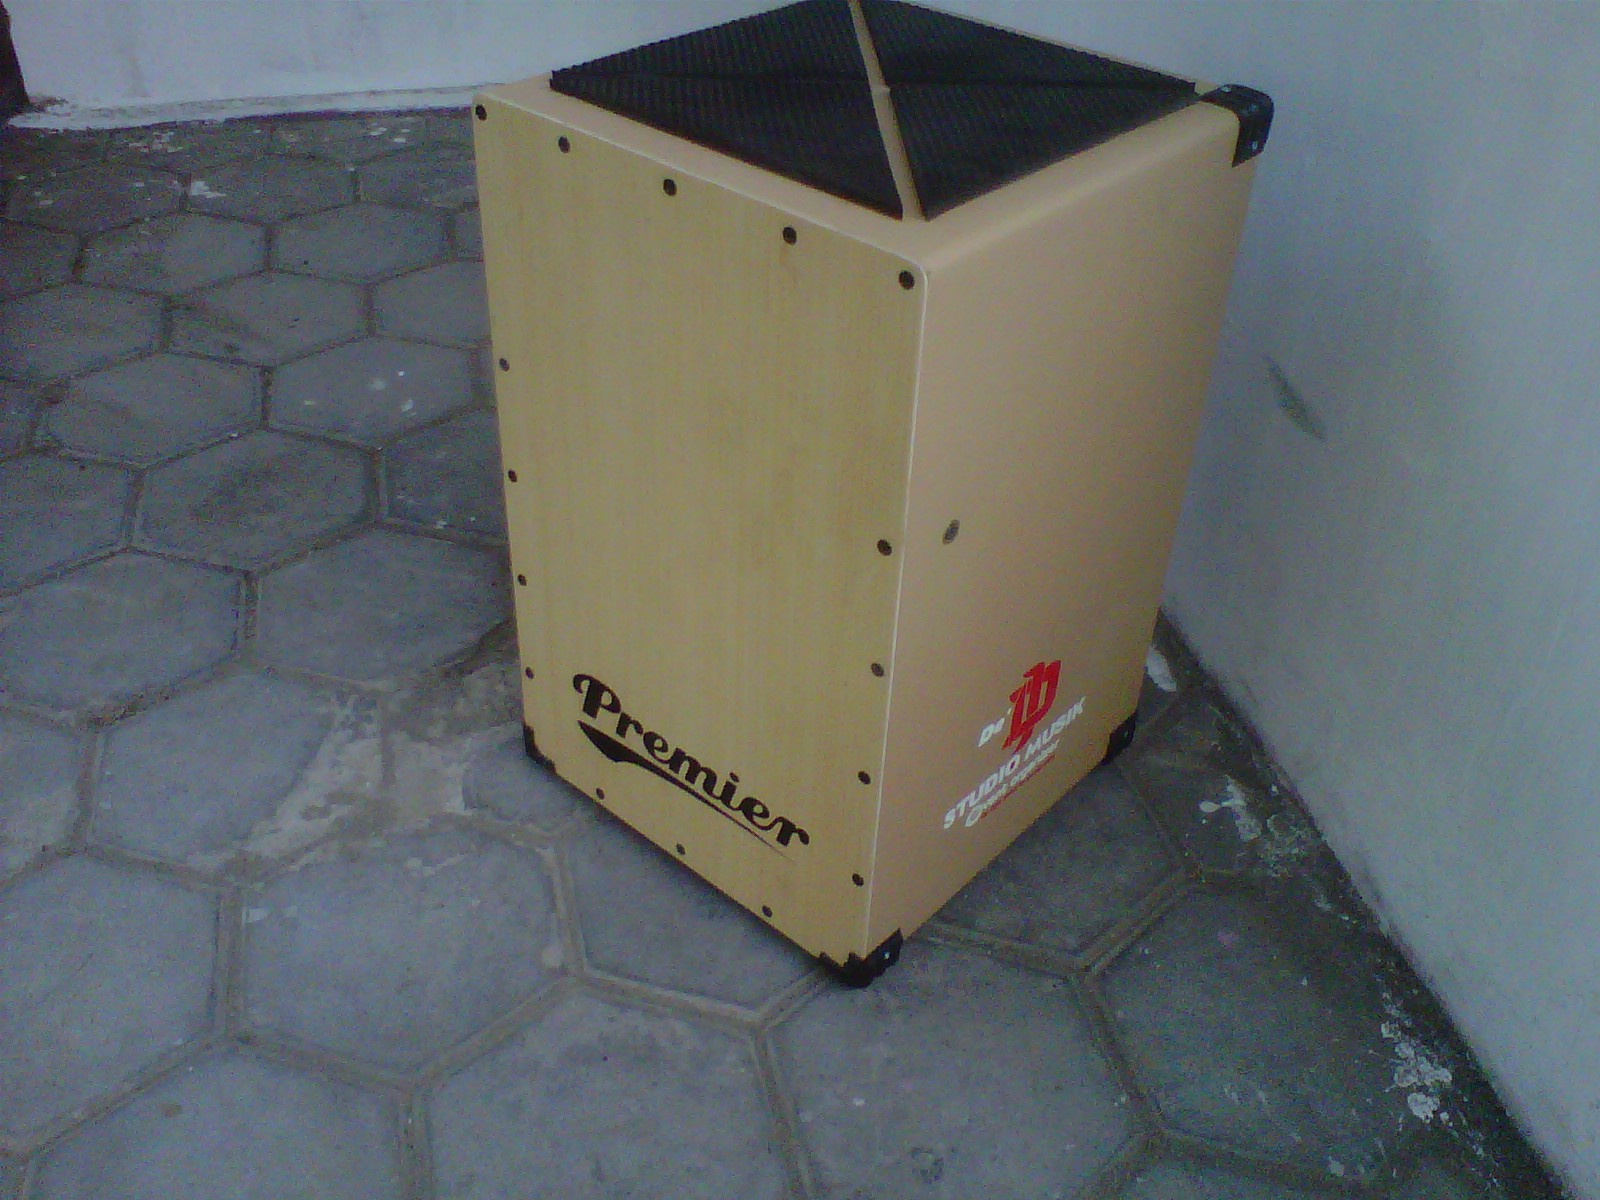 Cajon Kahon Drumbox Murah Ahline Indonesia Trapesium Electric Kualitas Suara Berani Diadu Sama Produk Branded Yang Pake Maple Wood Ato Lain Mahal2